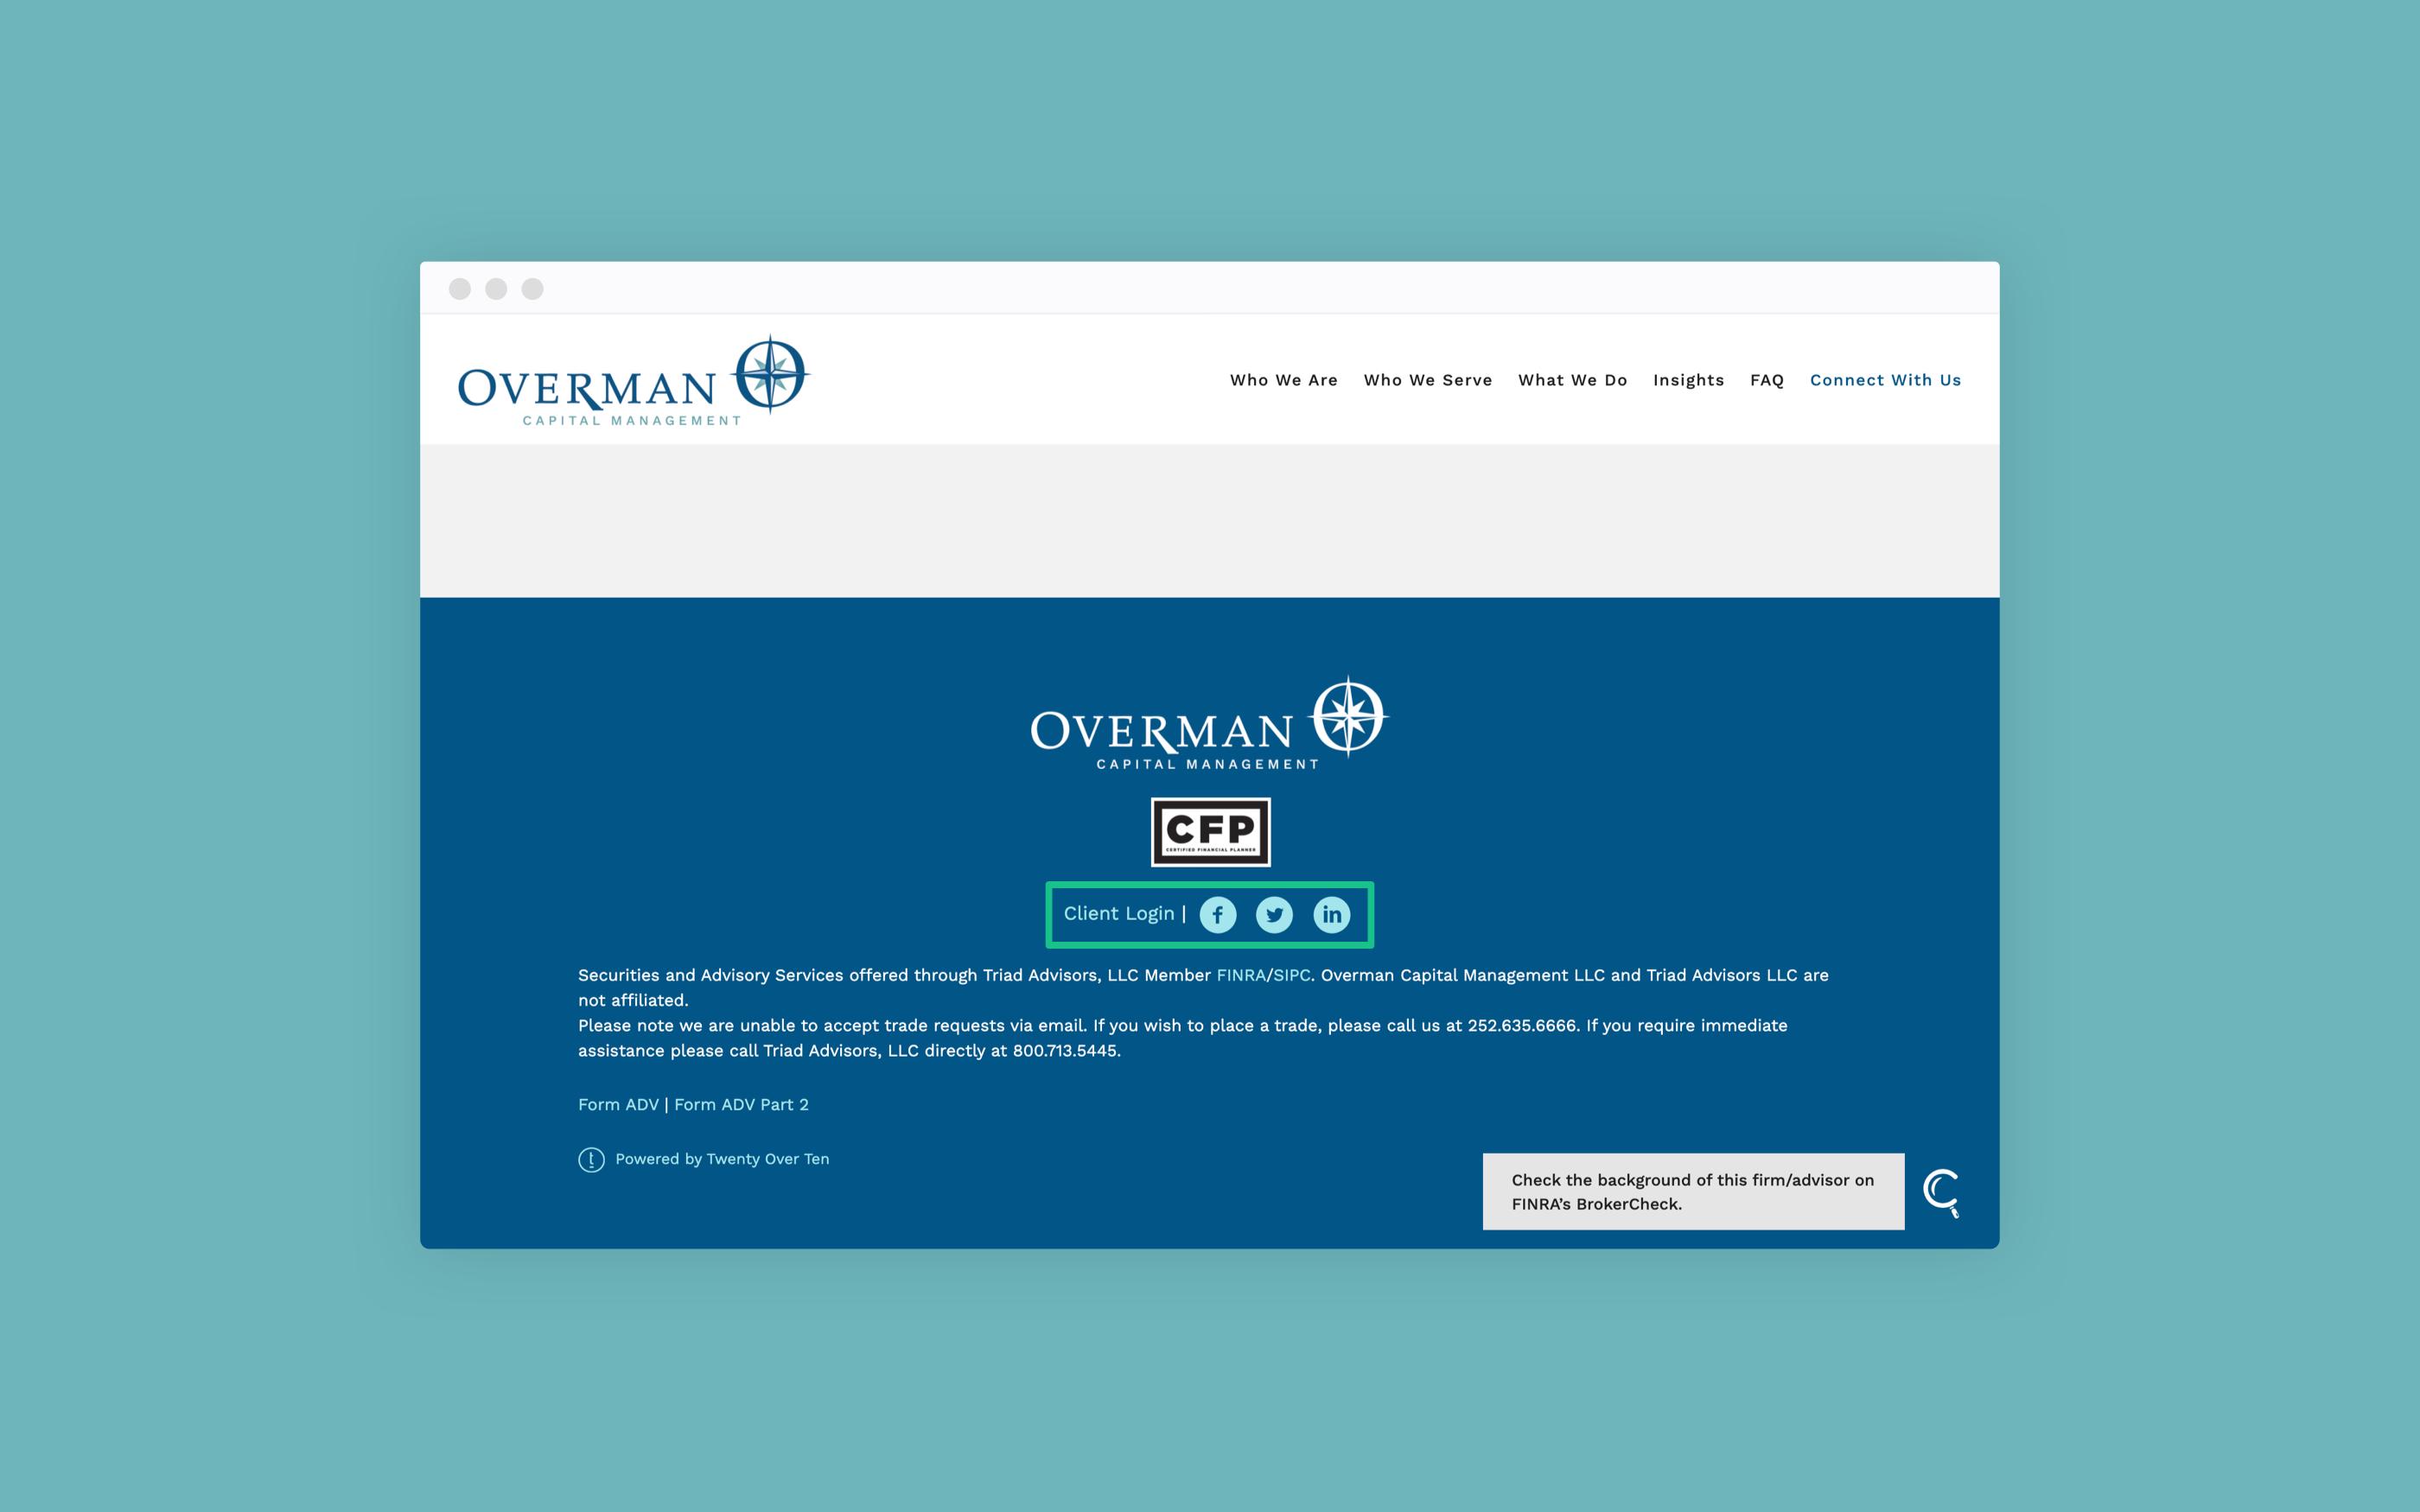 Overman Capital Management social media